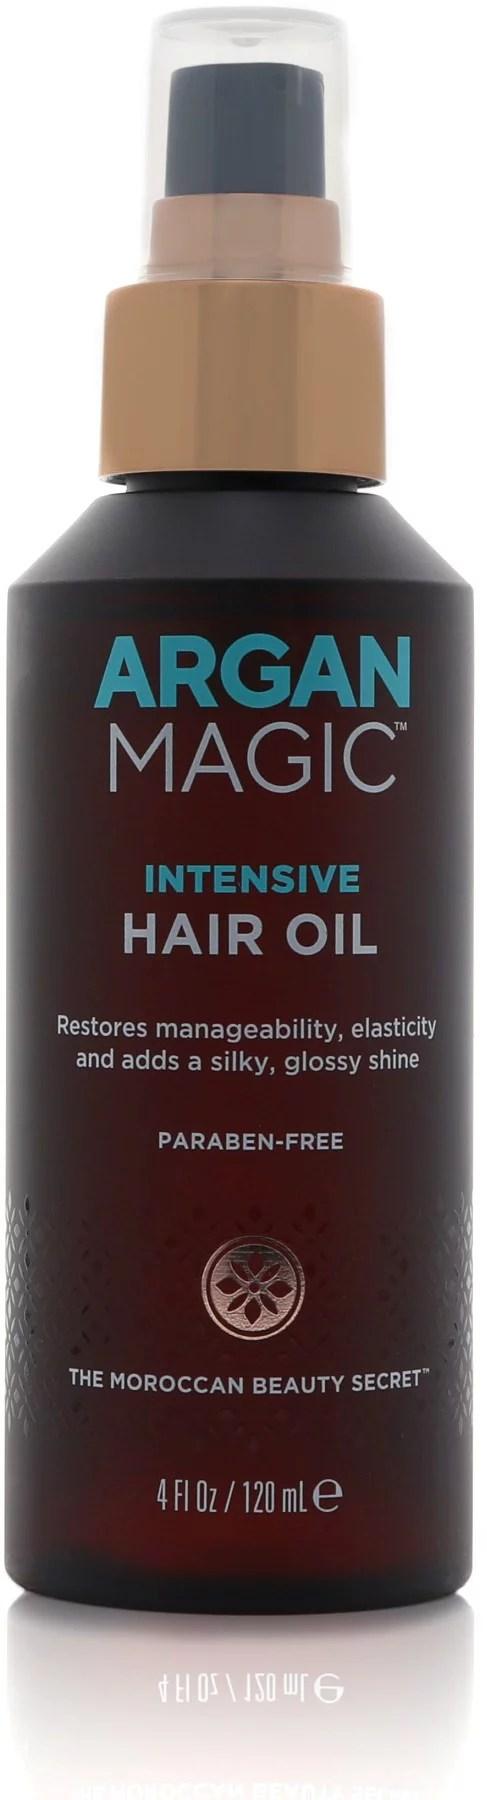 Argan Magic Intensive Hair Oil 4 oz - Walmart.com ...